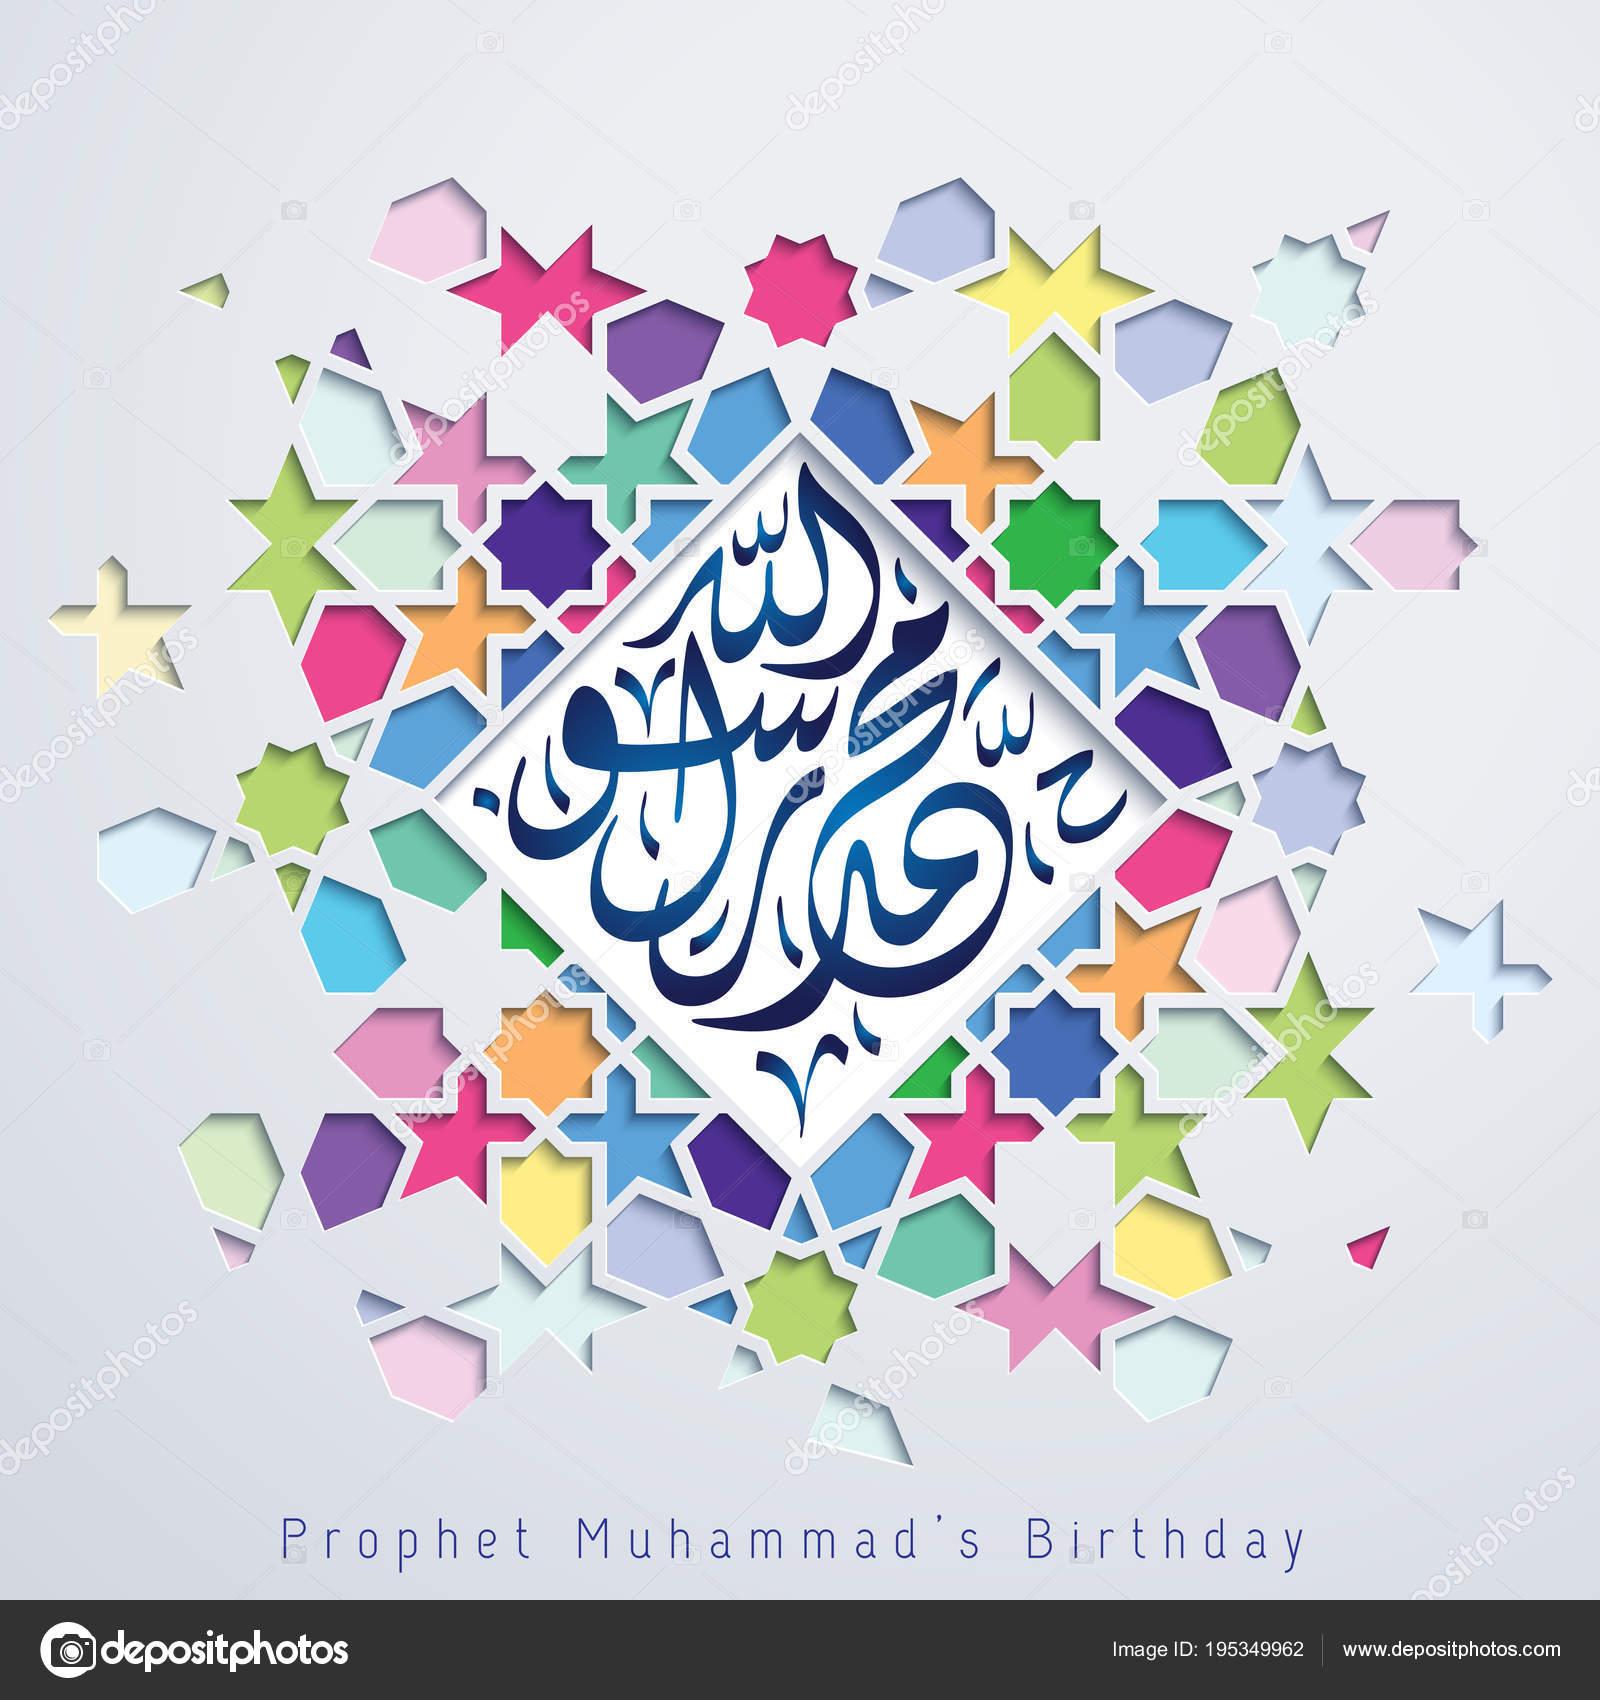 Mawlid nabi islamic greeting arabic calligraphy colorful pattern mawlid nabi islamic greeting arabic calligraphy colorful pattern stock vector m4hsunfo